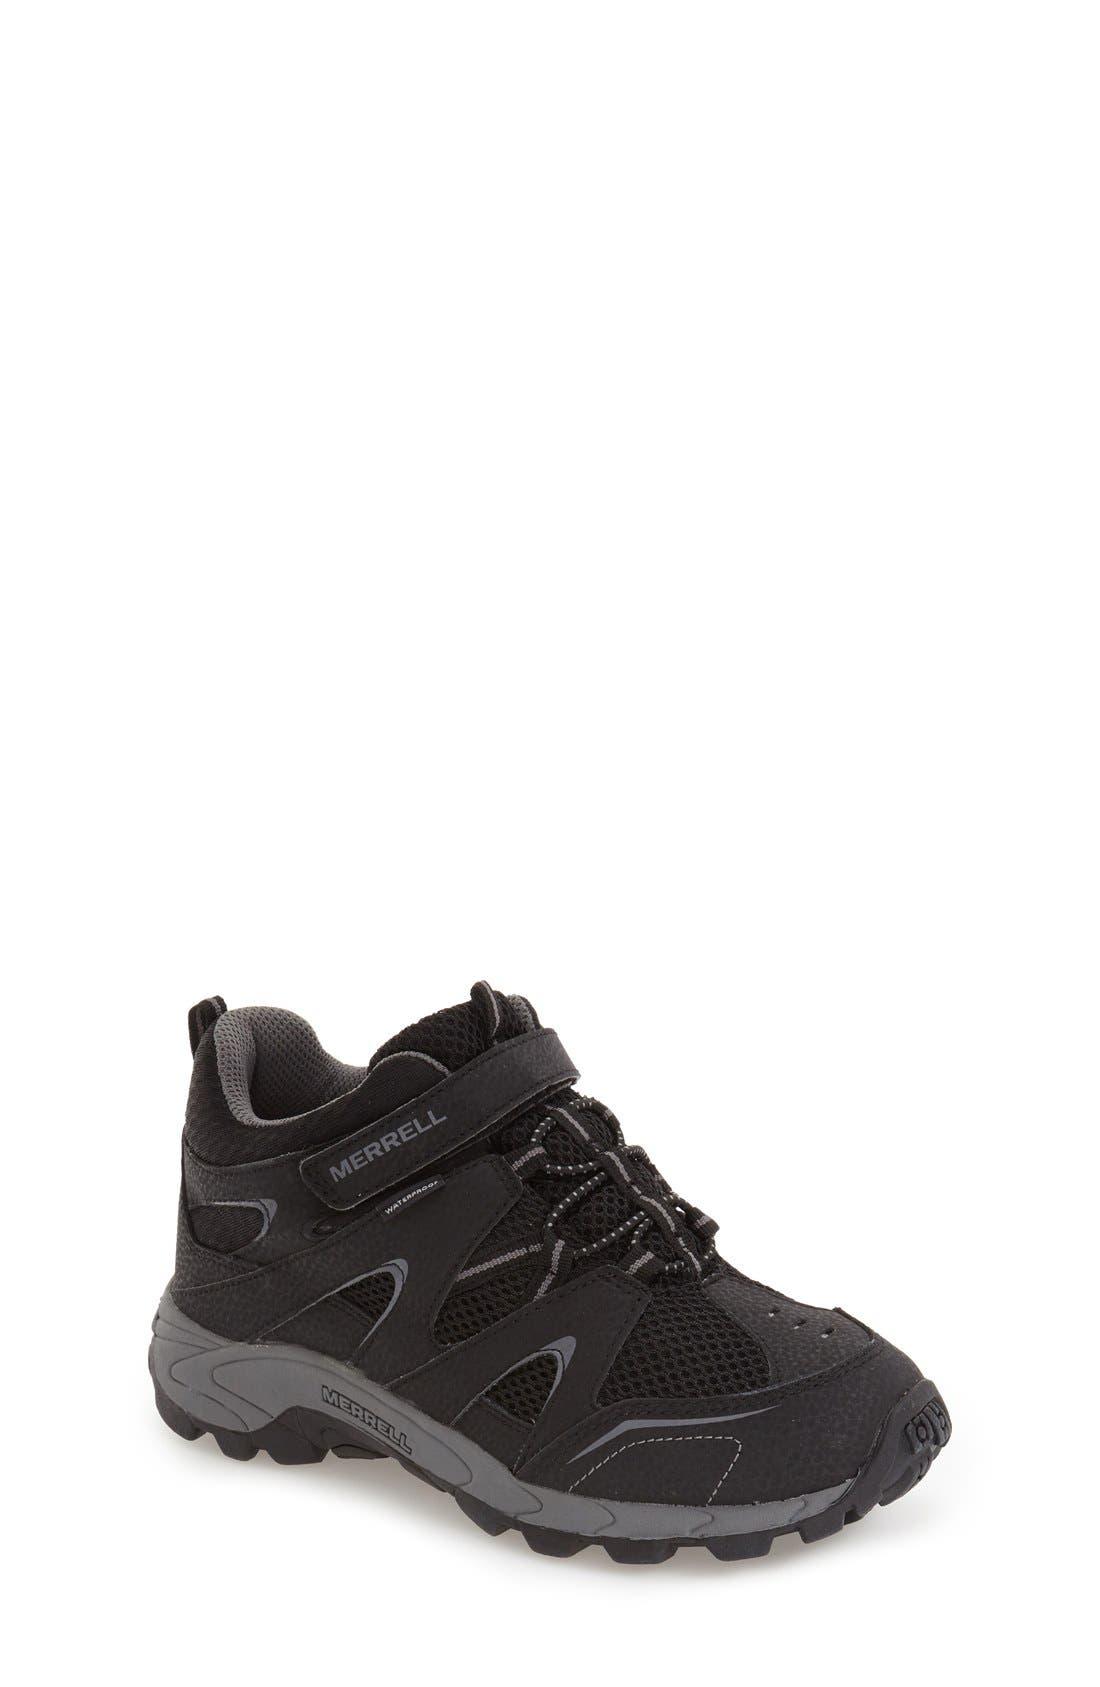 'Hilltop' Waterproof Sneaker,                         Main,                         color, 001